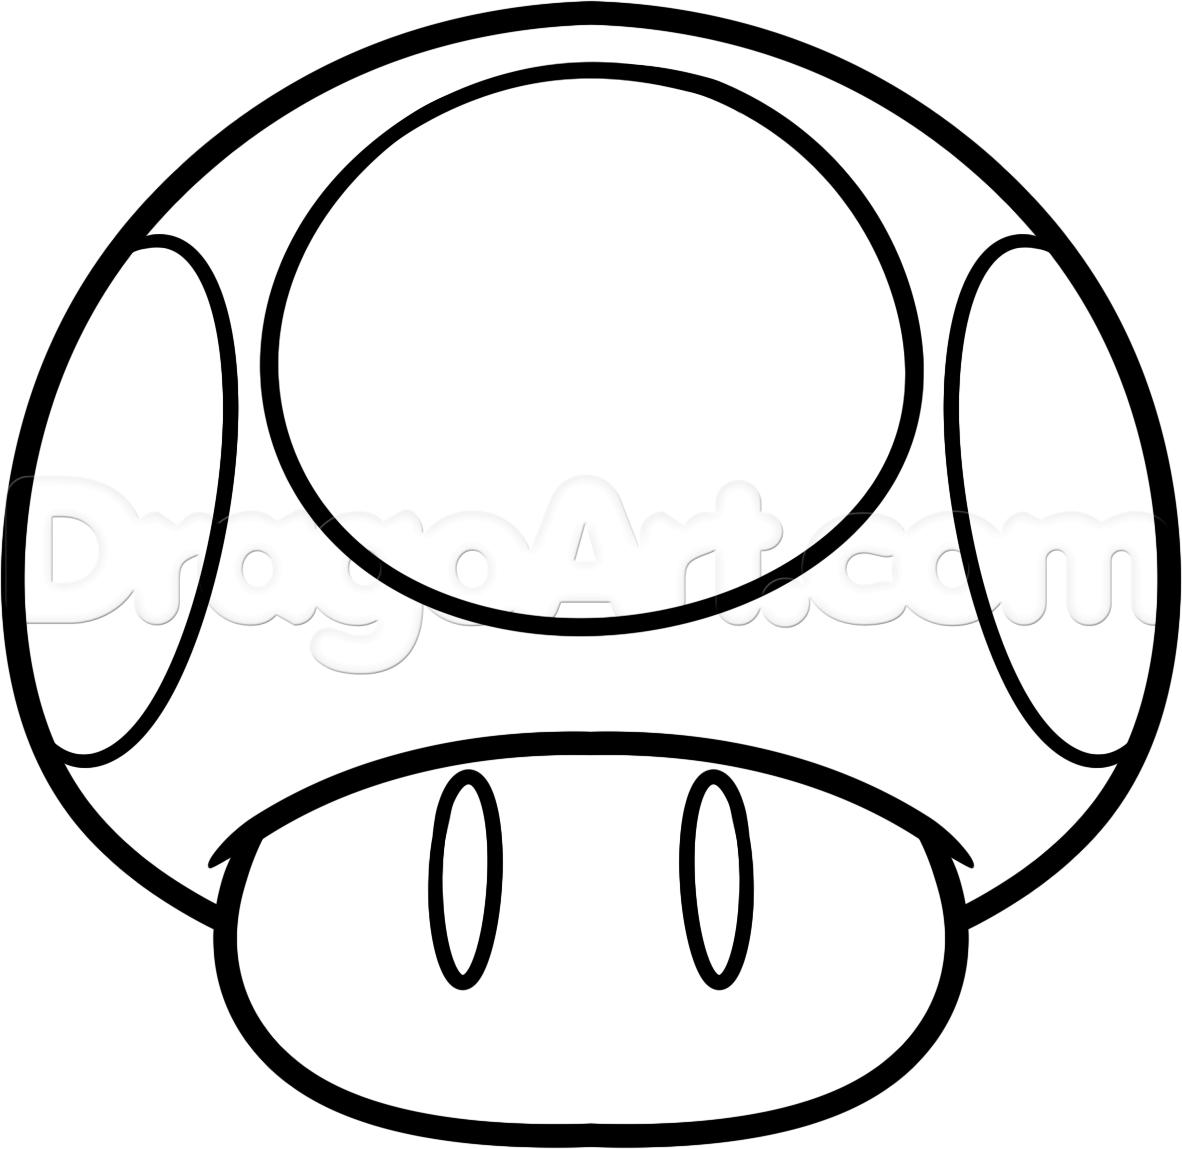 Mario Mushroom Coloring Page At Getdrawings